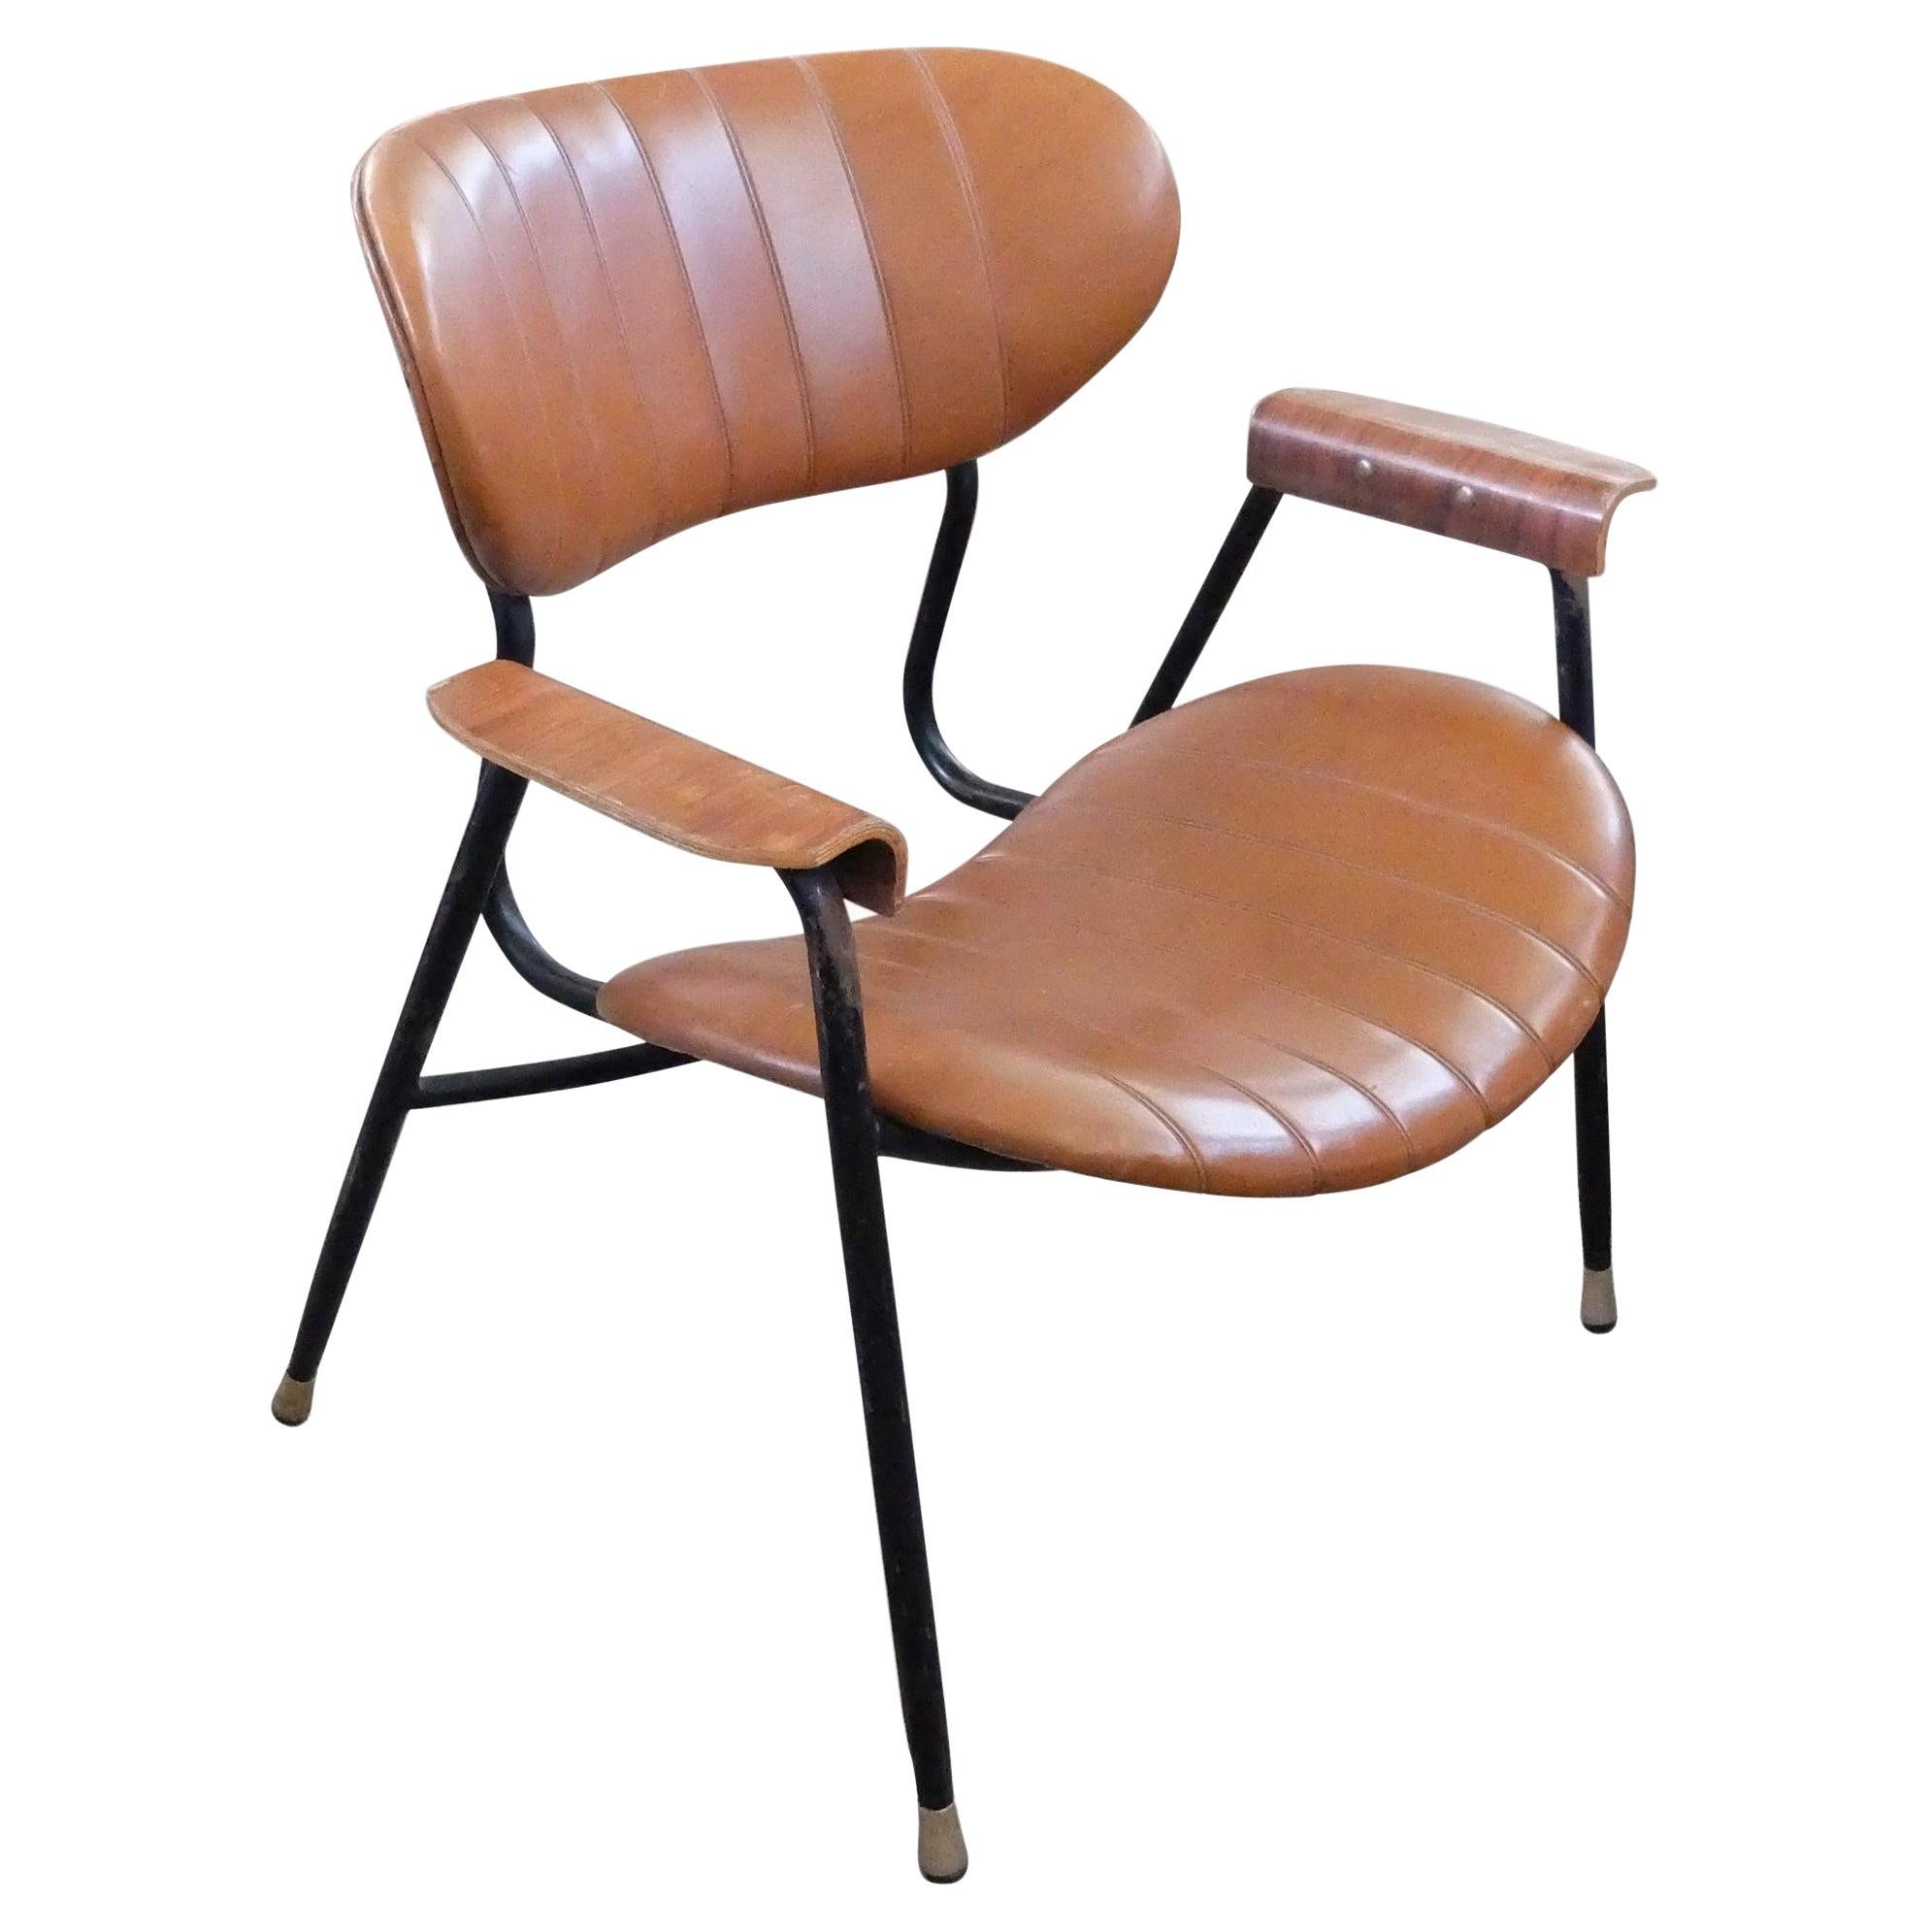 Gastone Rinaldi for Rima, Italian Mid-Century Leather Lounge Chair, 1950